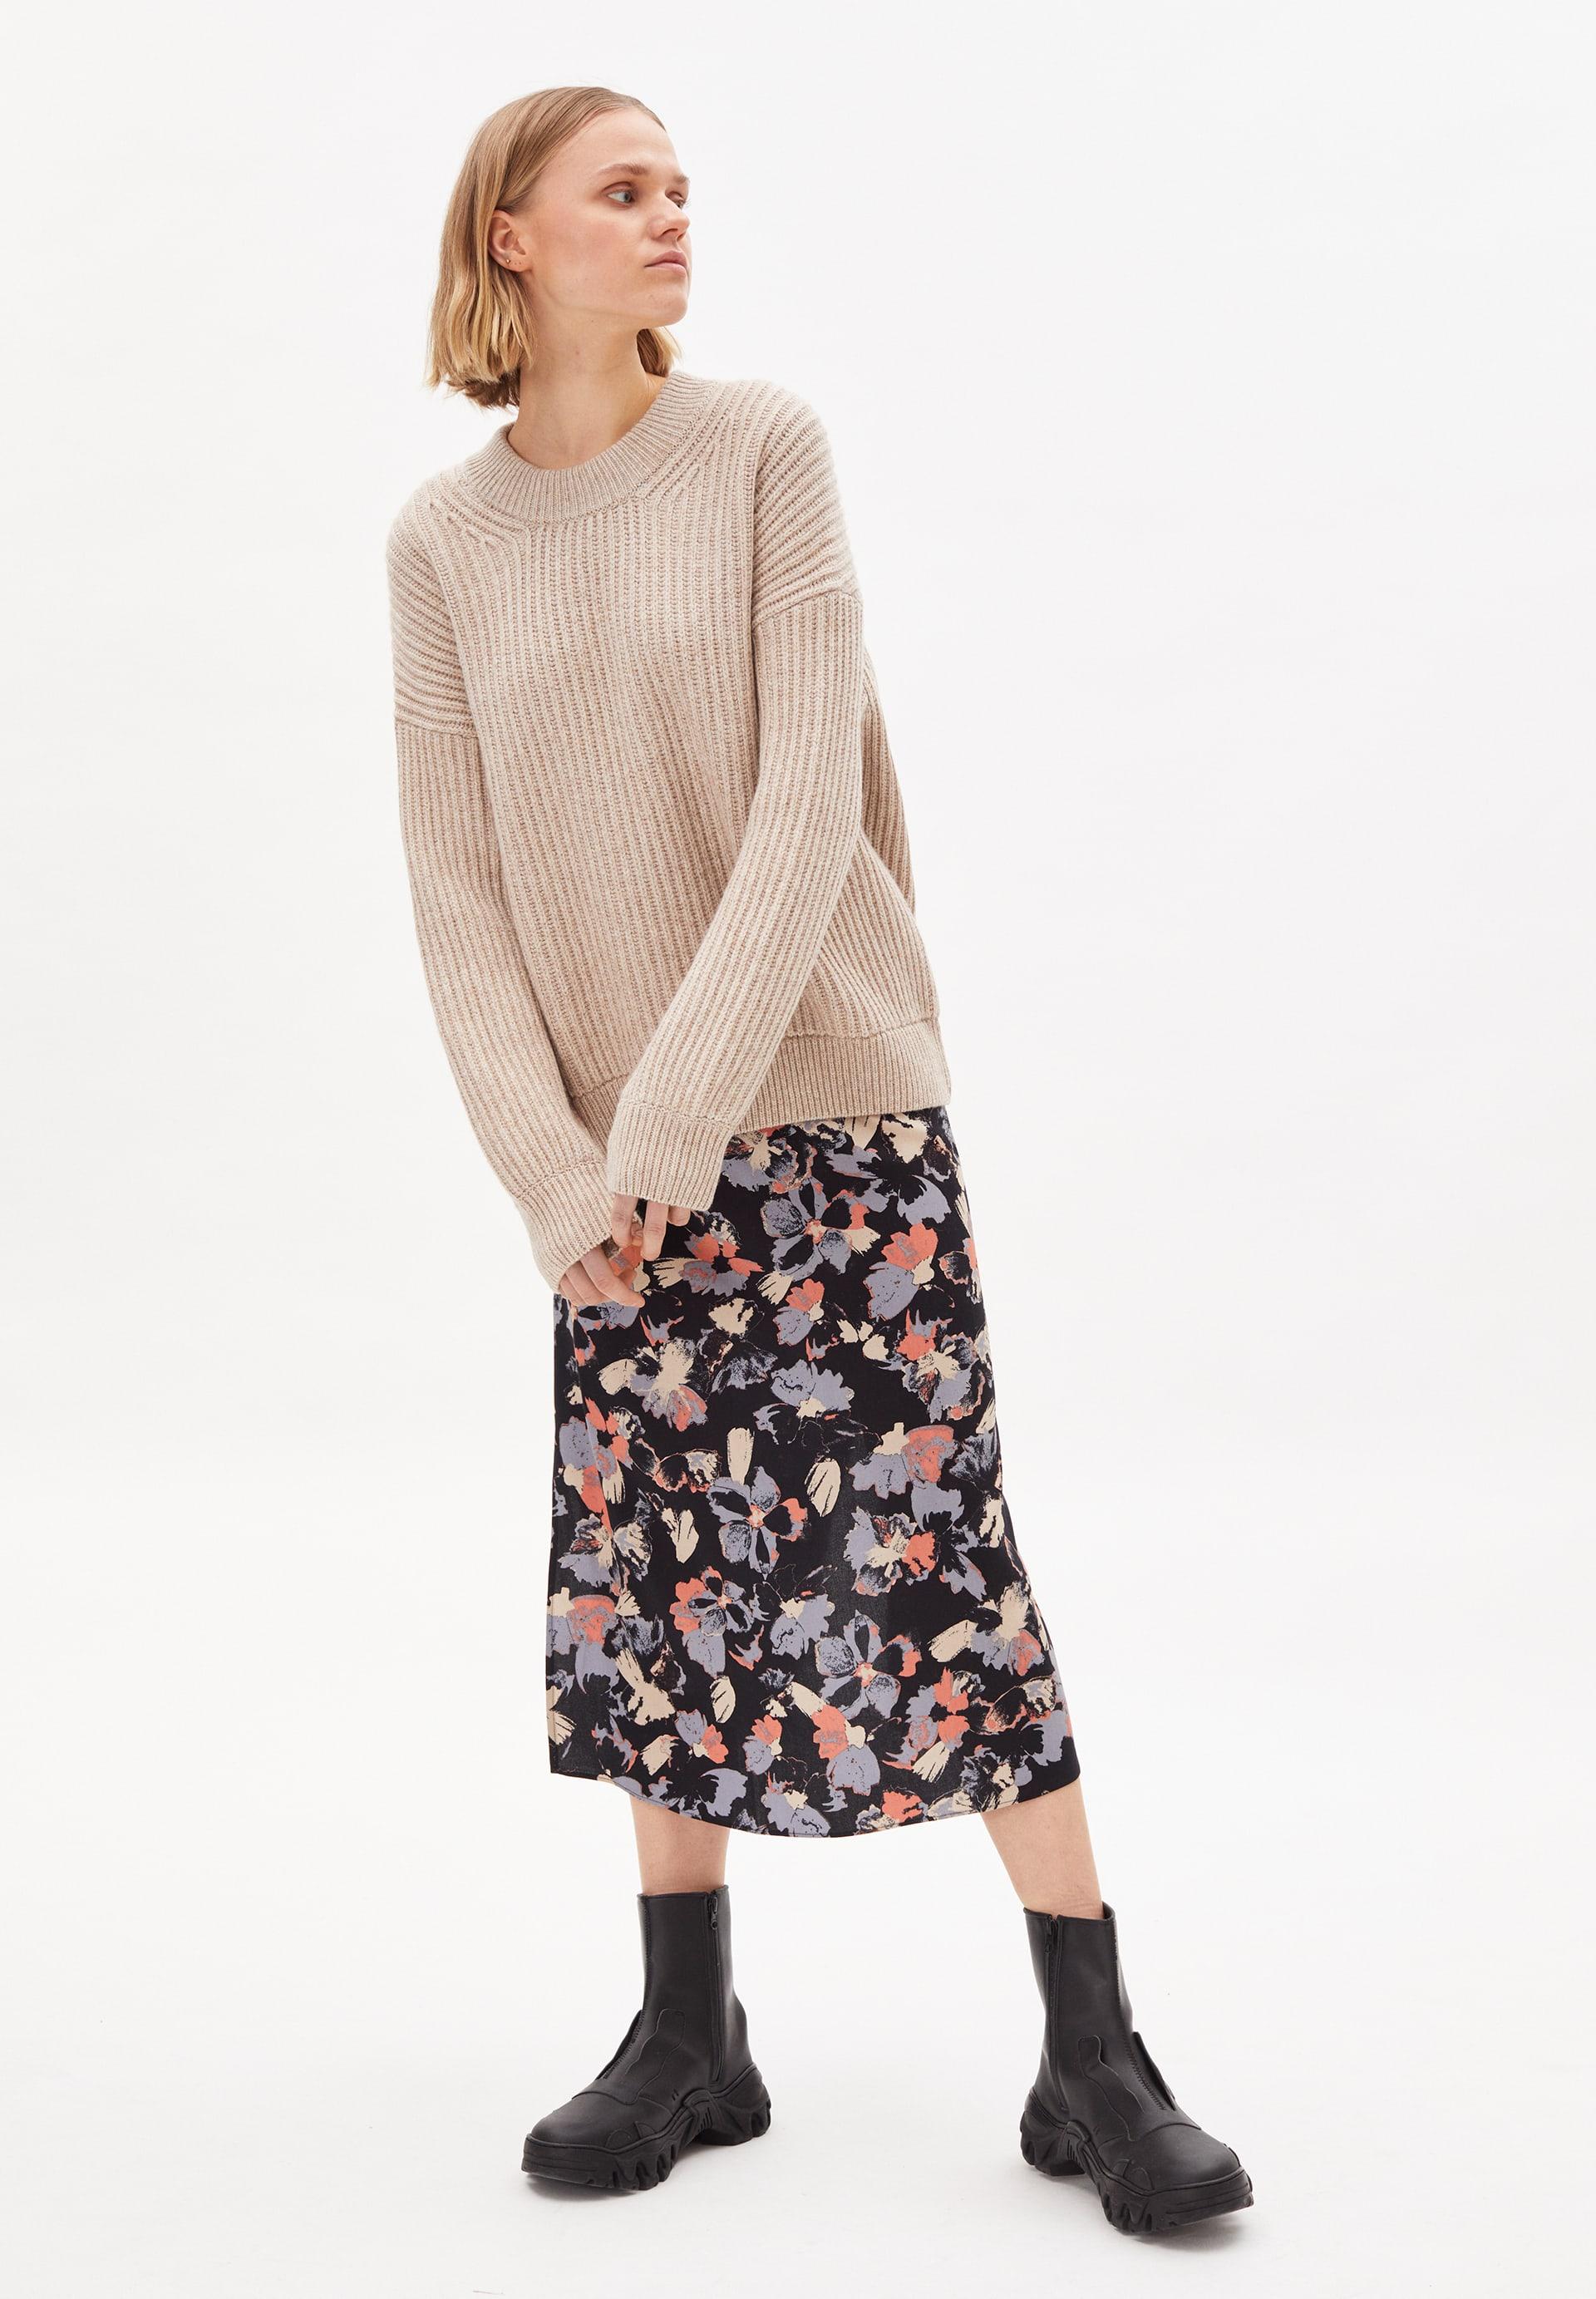 HILARIAA SOFT Sweater made of Organic Wool Mix